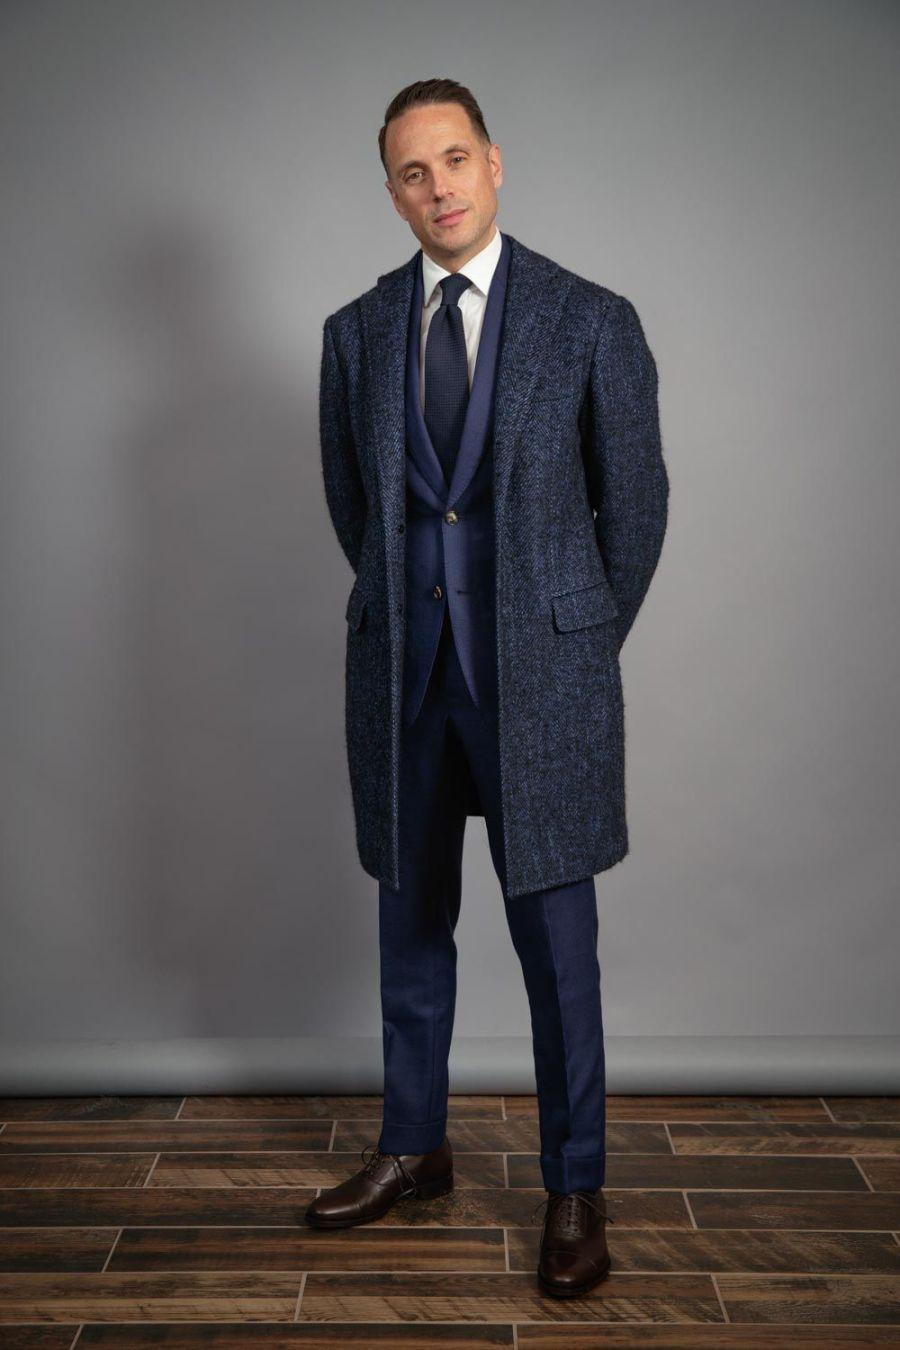 navy-suit-capsule-wardrobe-white-shirt-grenadine-tie-brown-shoes-blue-overcoat